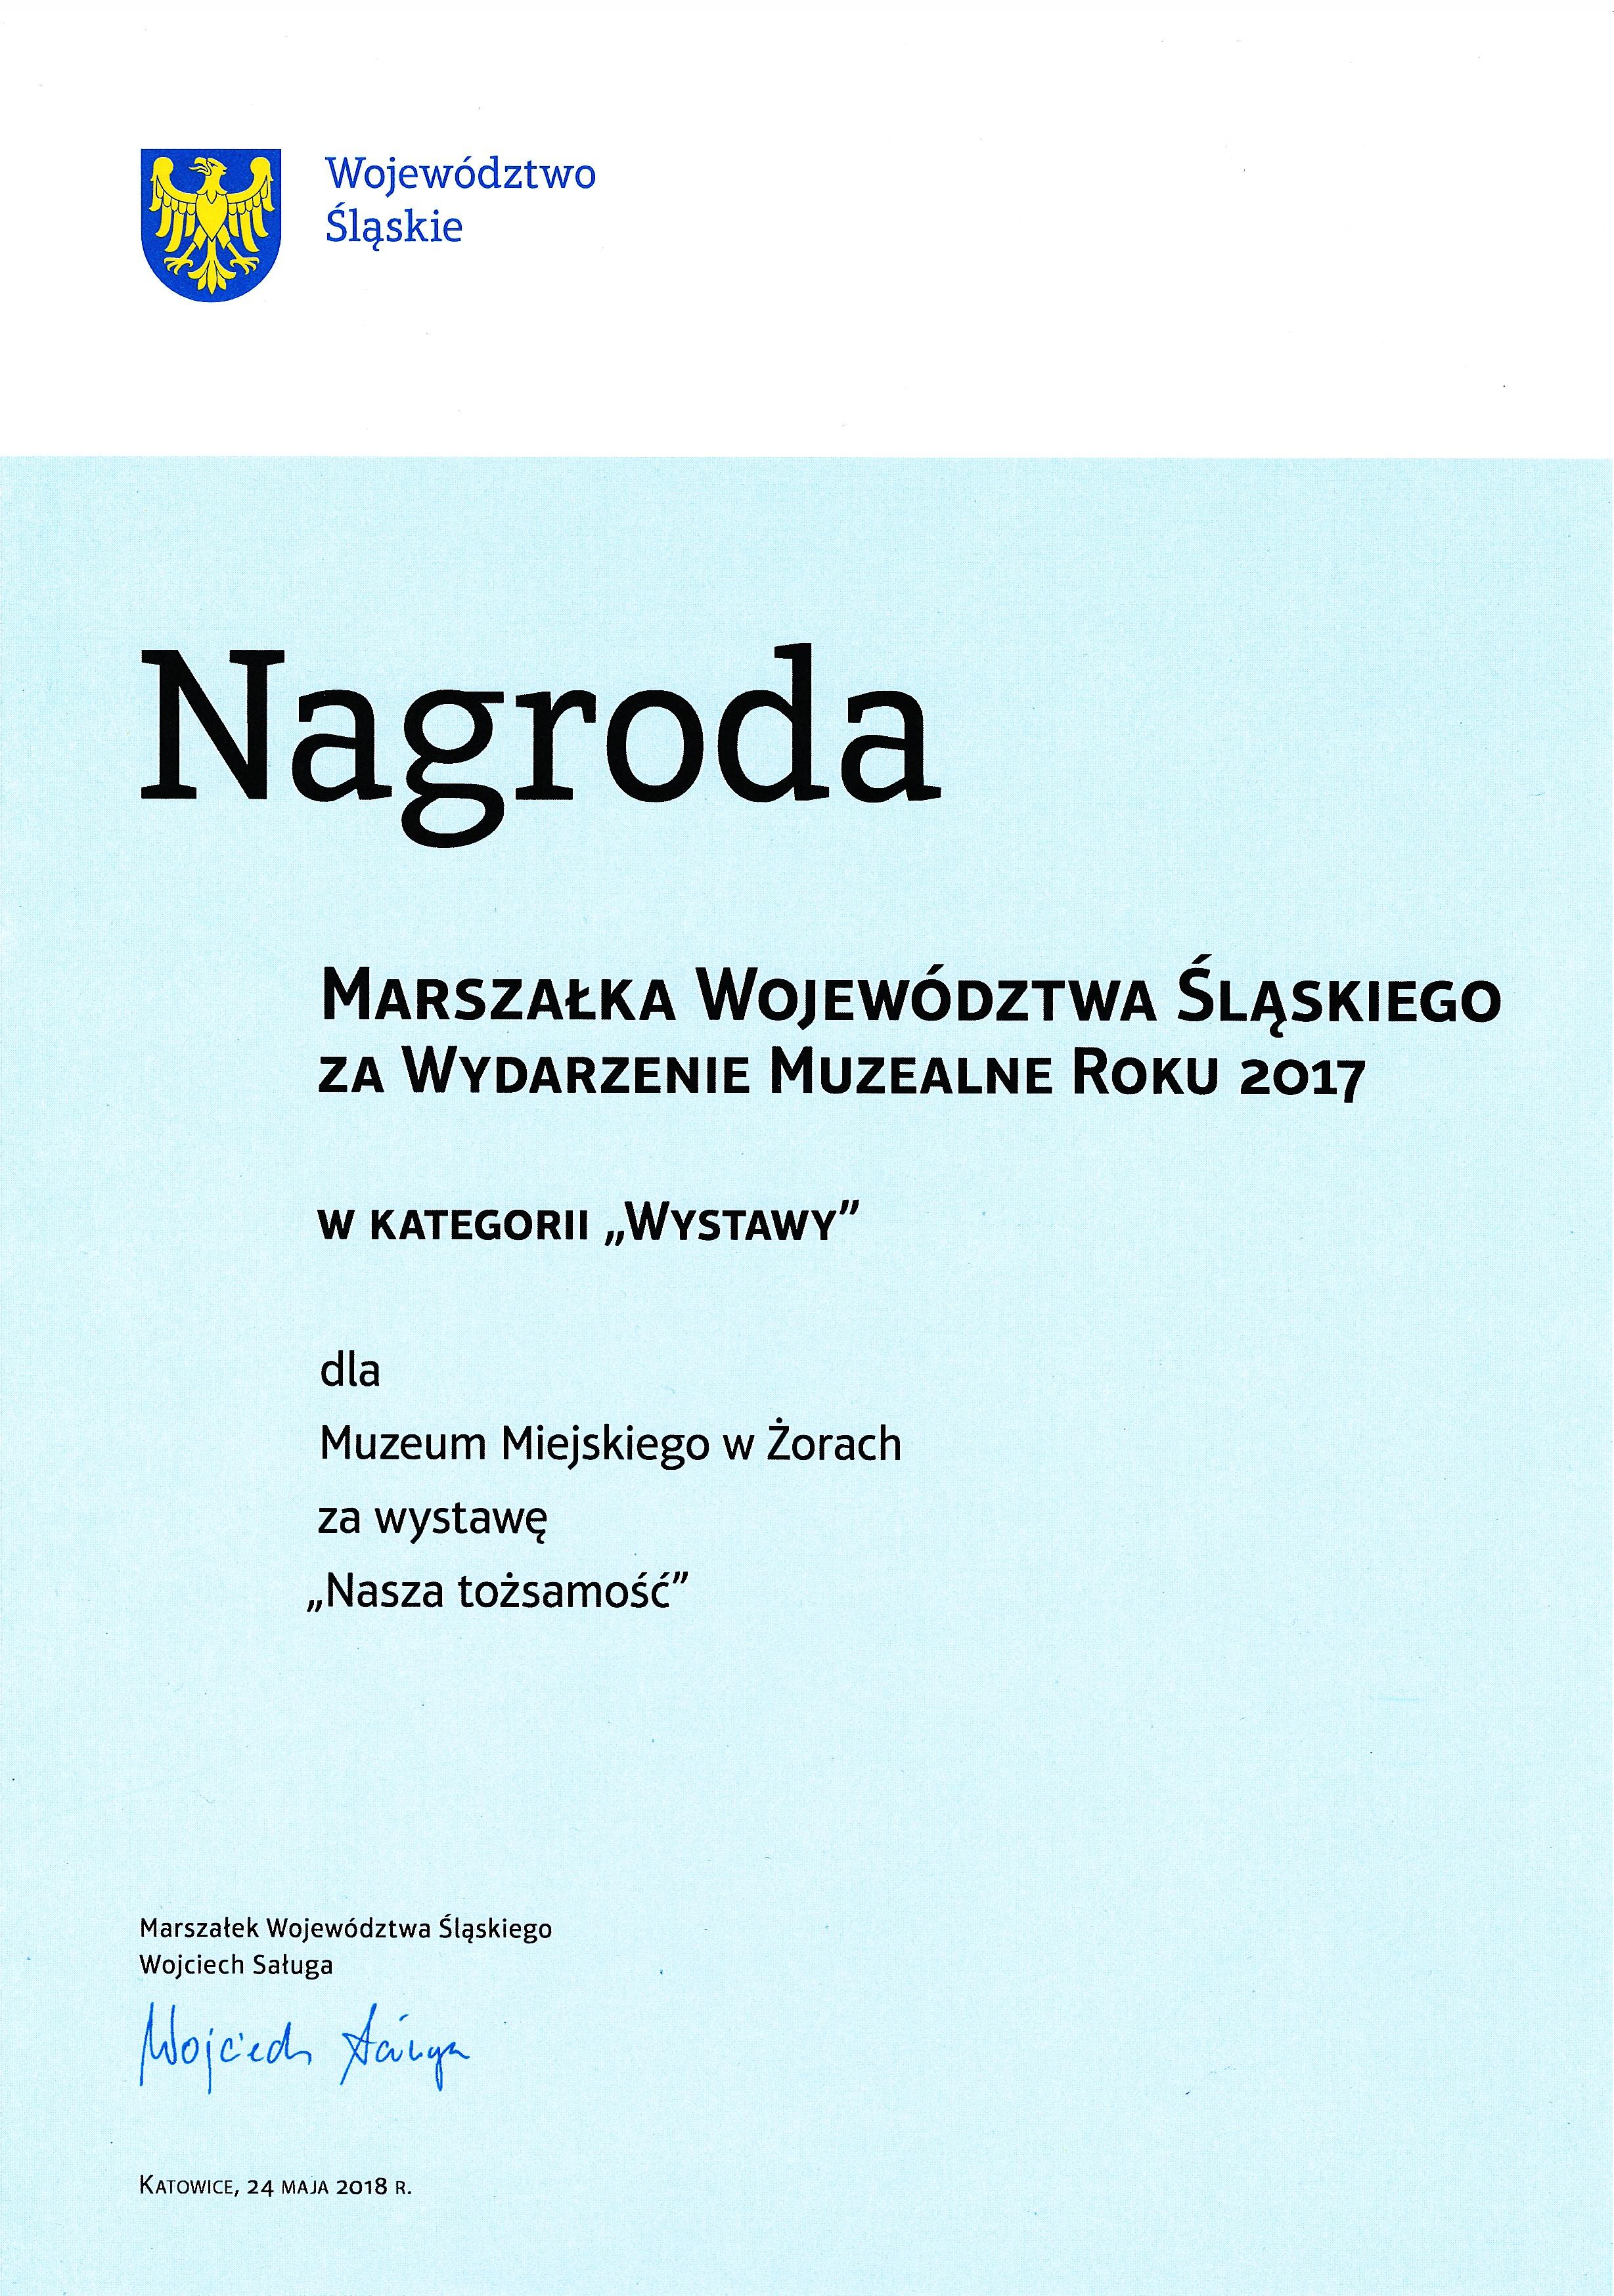 DYPLOM-wystawa-Nasza-Tozsamosc